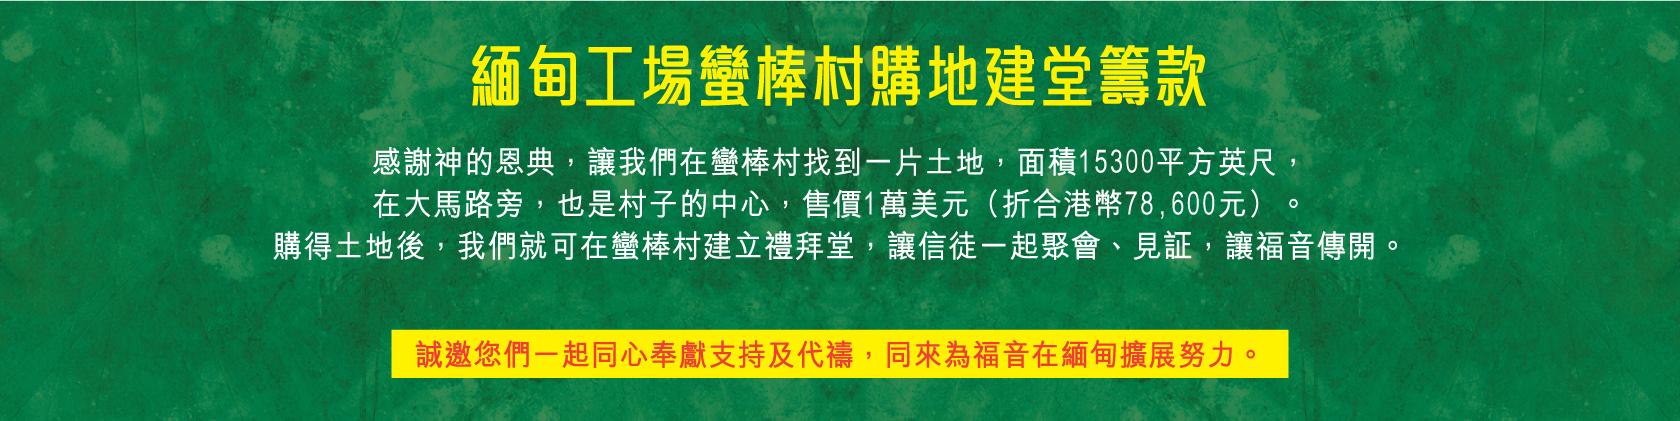 CB-02-web-banner-1680-x-420-04-1